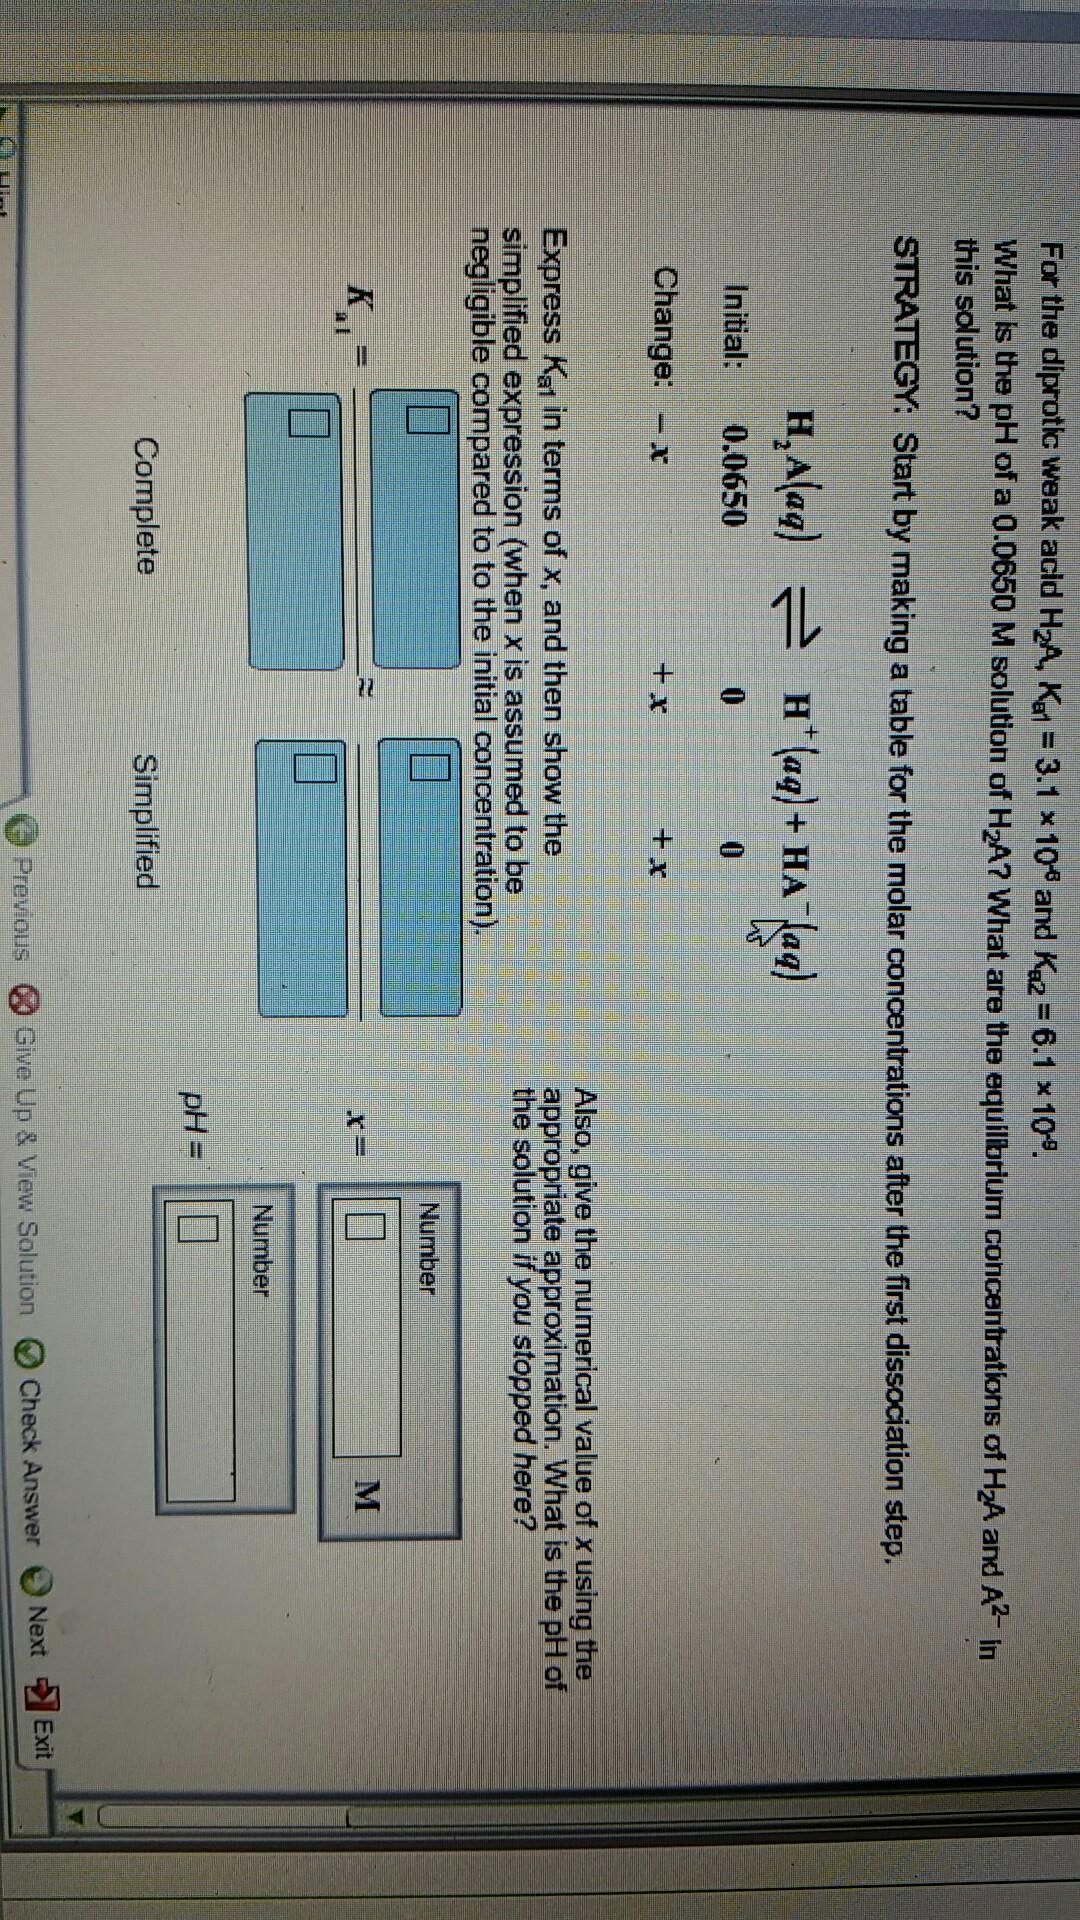 Chem 2 Exam 2 Flashcards | Quizlet